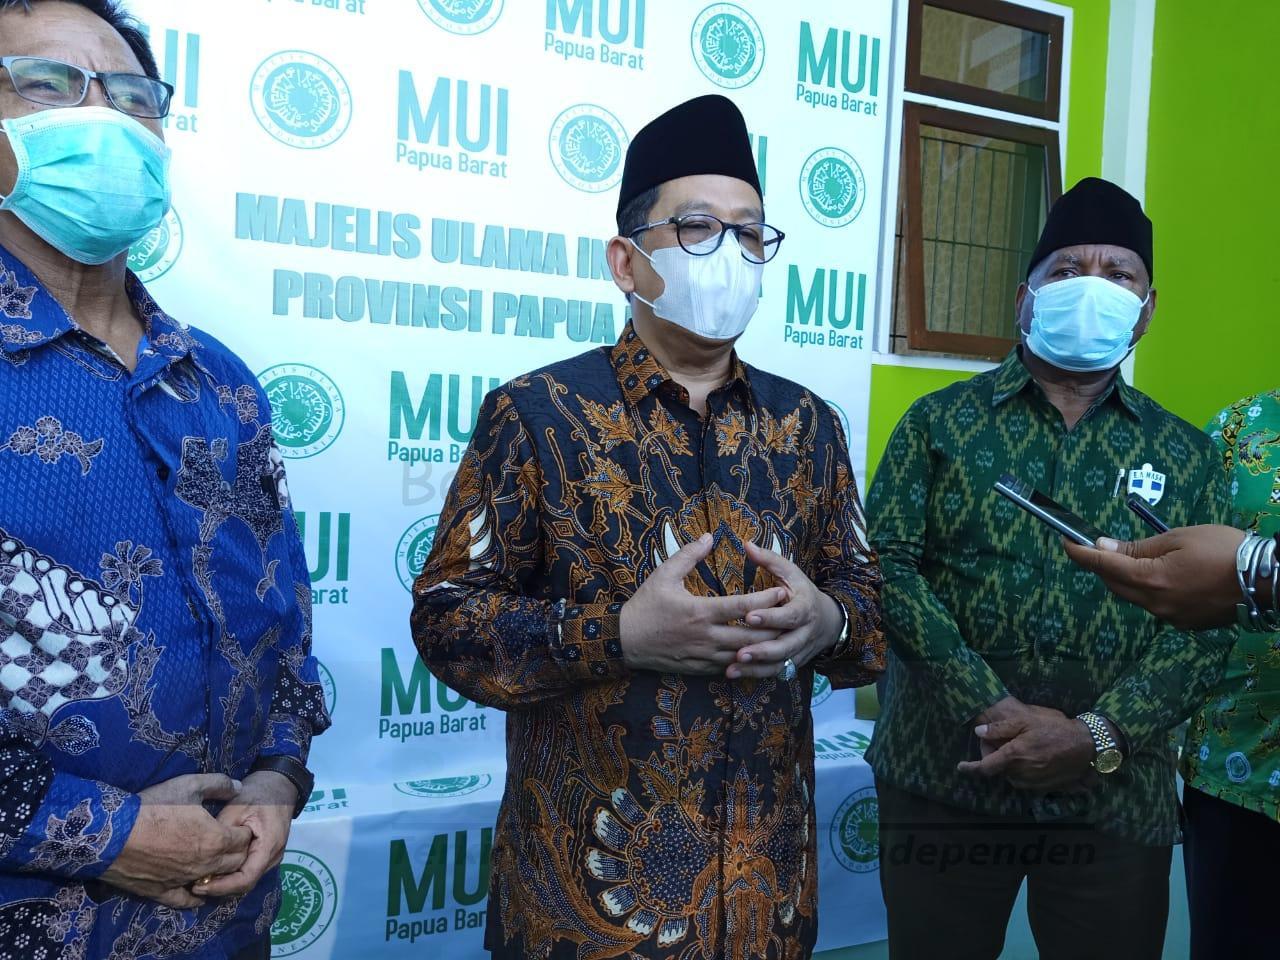 Wakil Menteri Agama Puji Gubernur Mandacan Bisa Jaga Toleransi Umat Beragama 1 IMG 20200821 WA0032